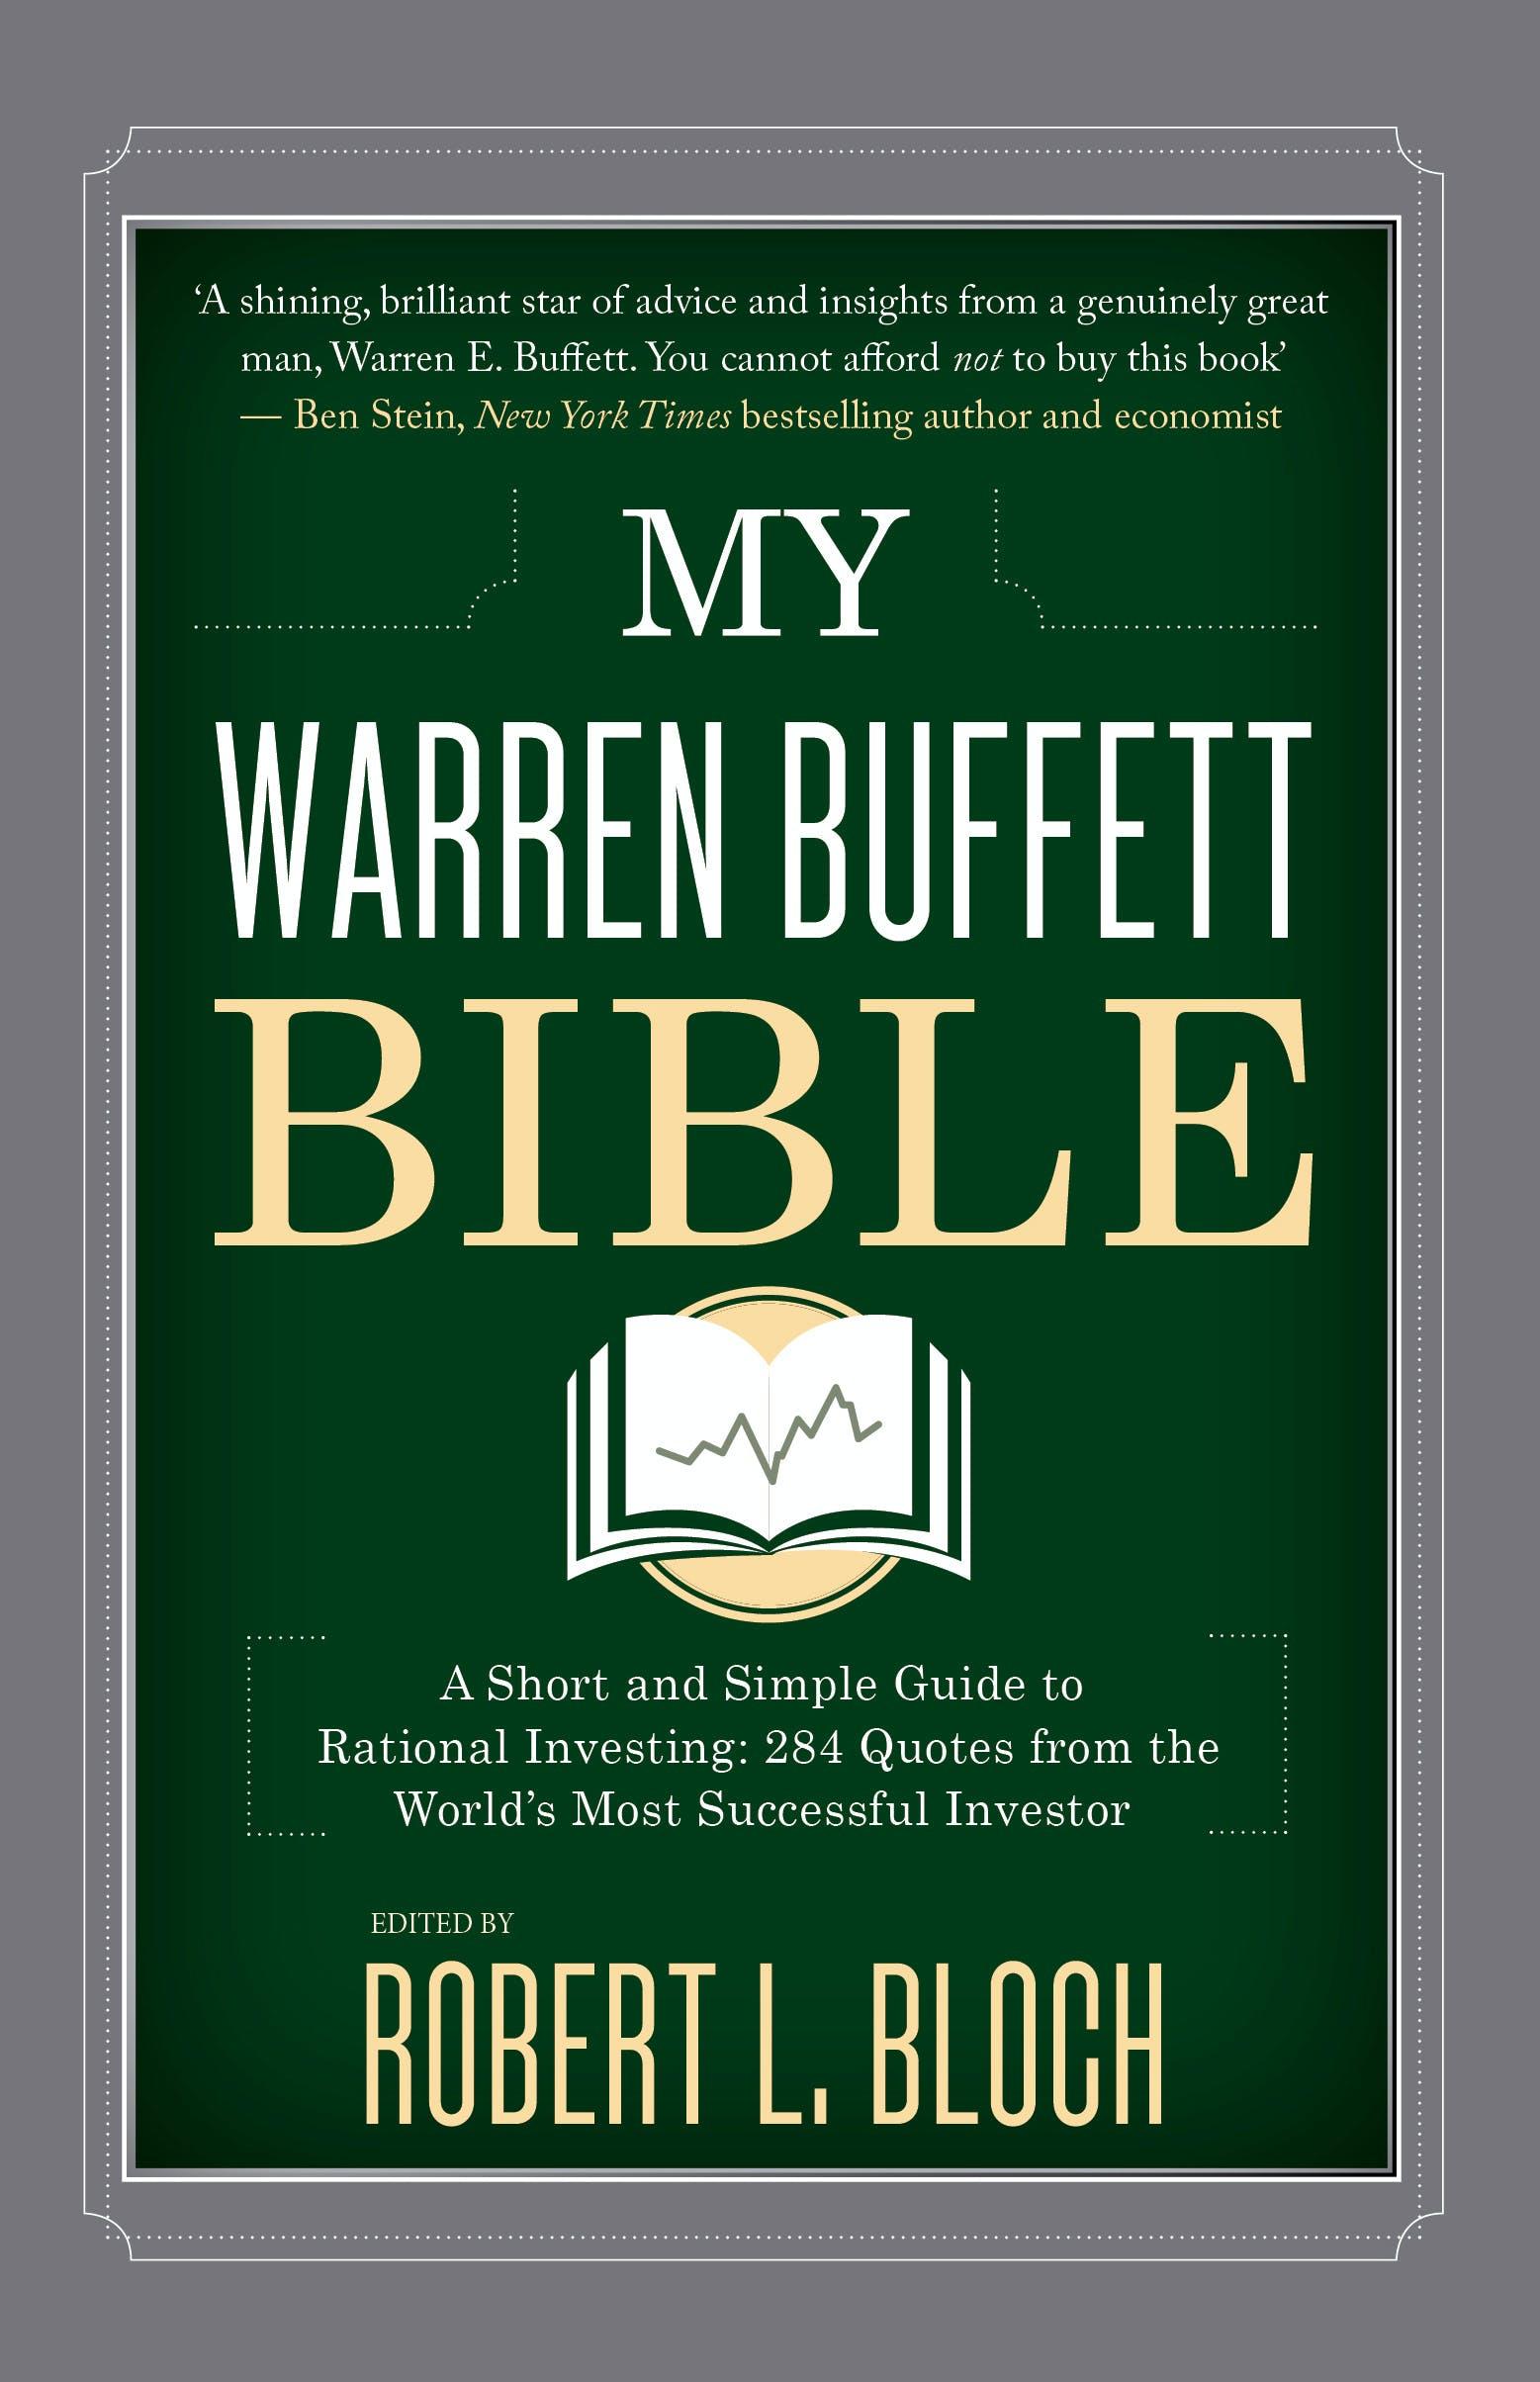 My Warren Buffett Bible: A Short and Simple Guide to ...